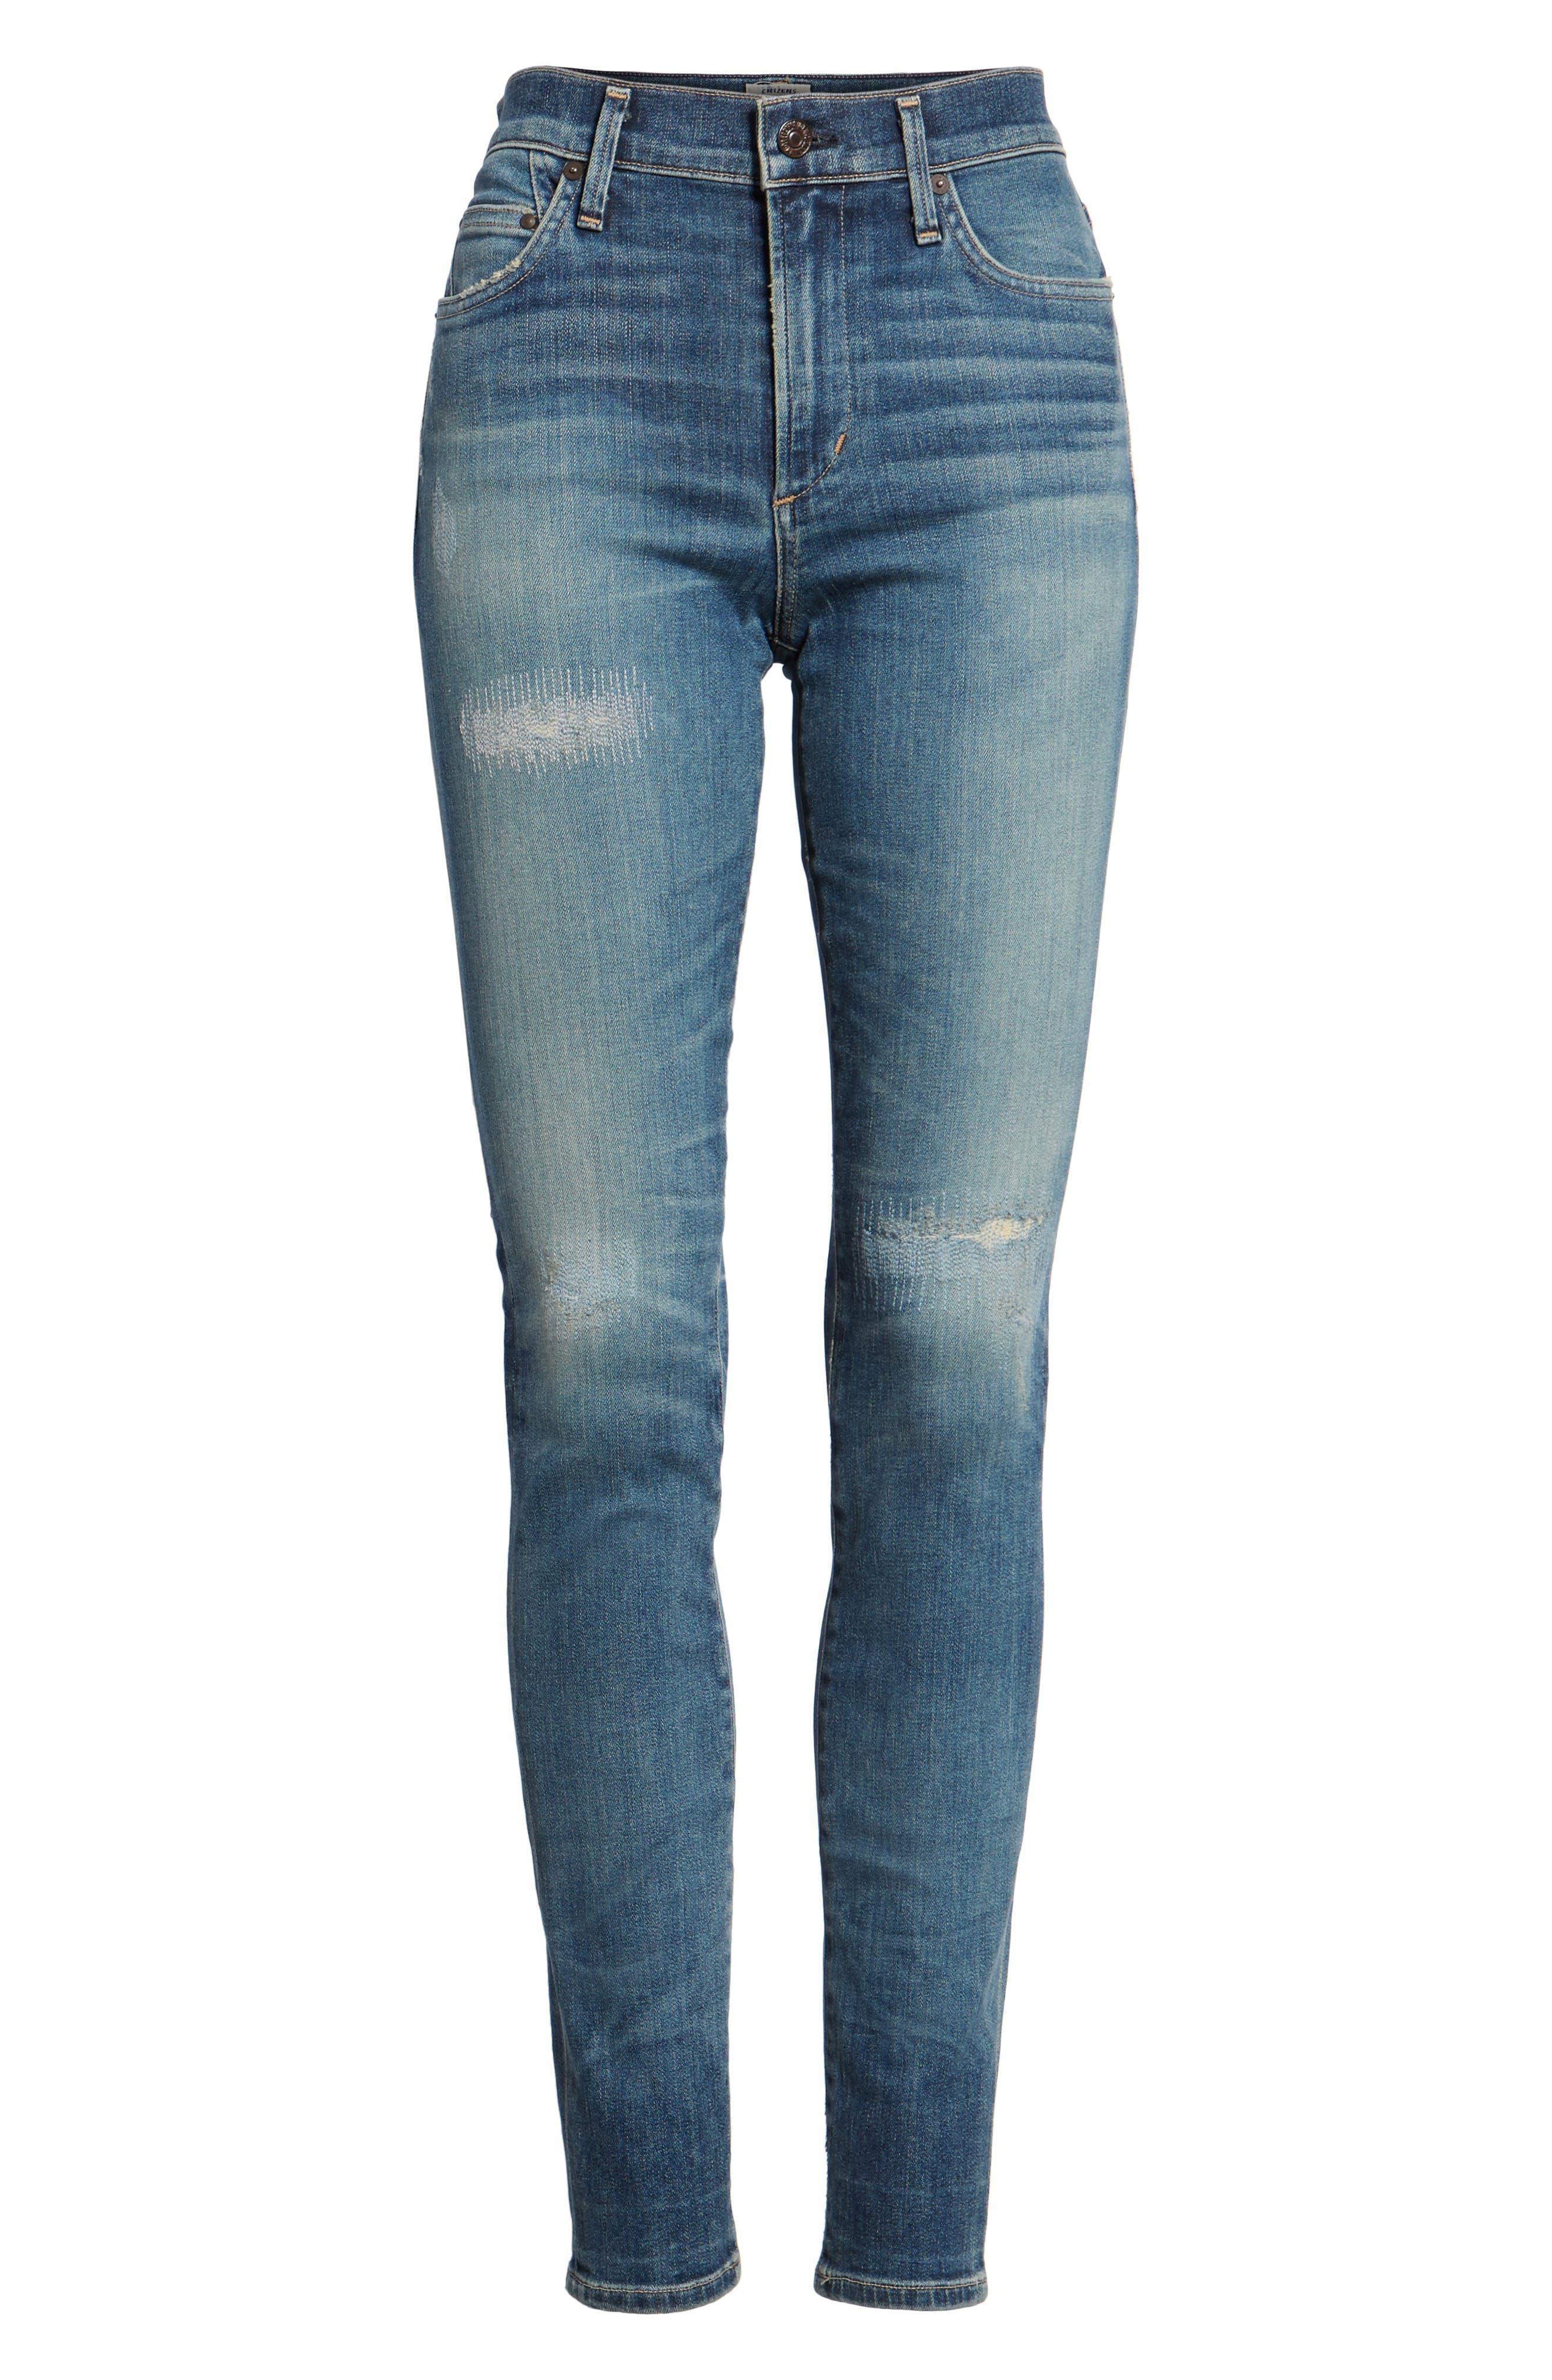 Rocket High Waist Skinny Jeans,                             Alternate thumbnail 7, color,                             465